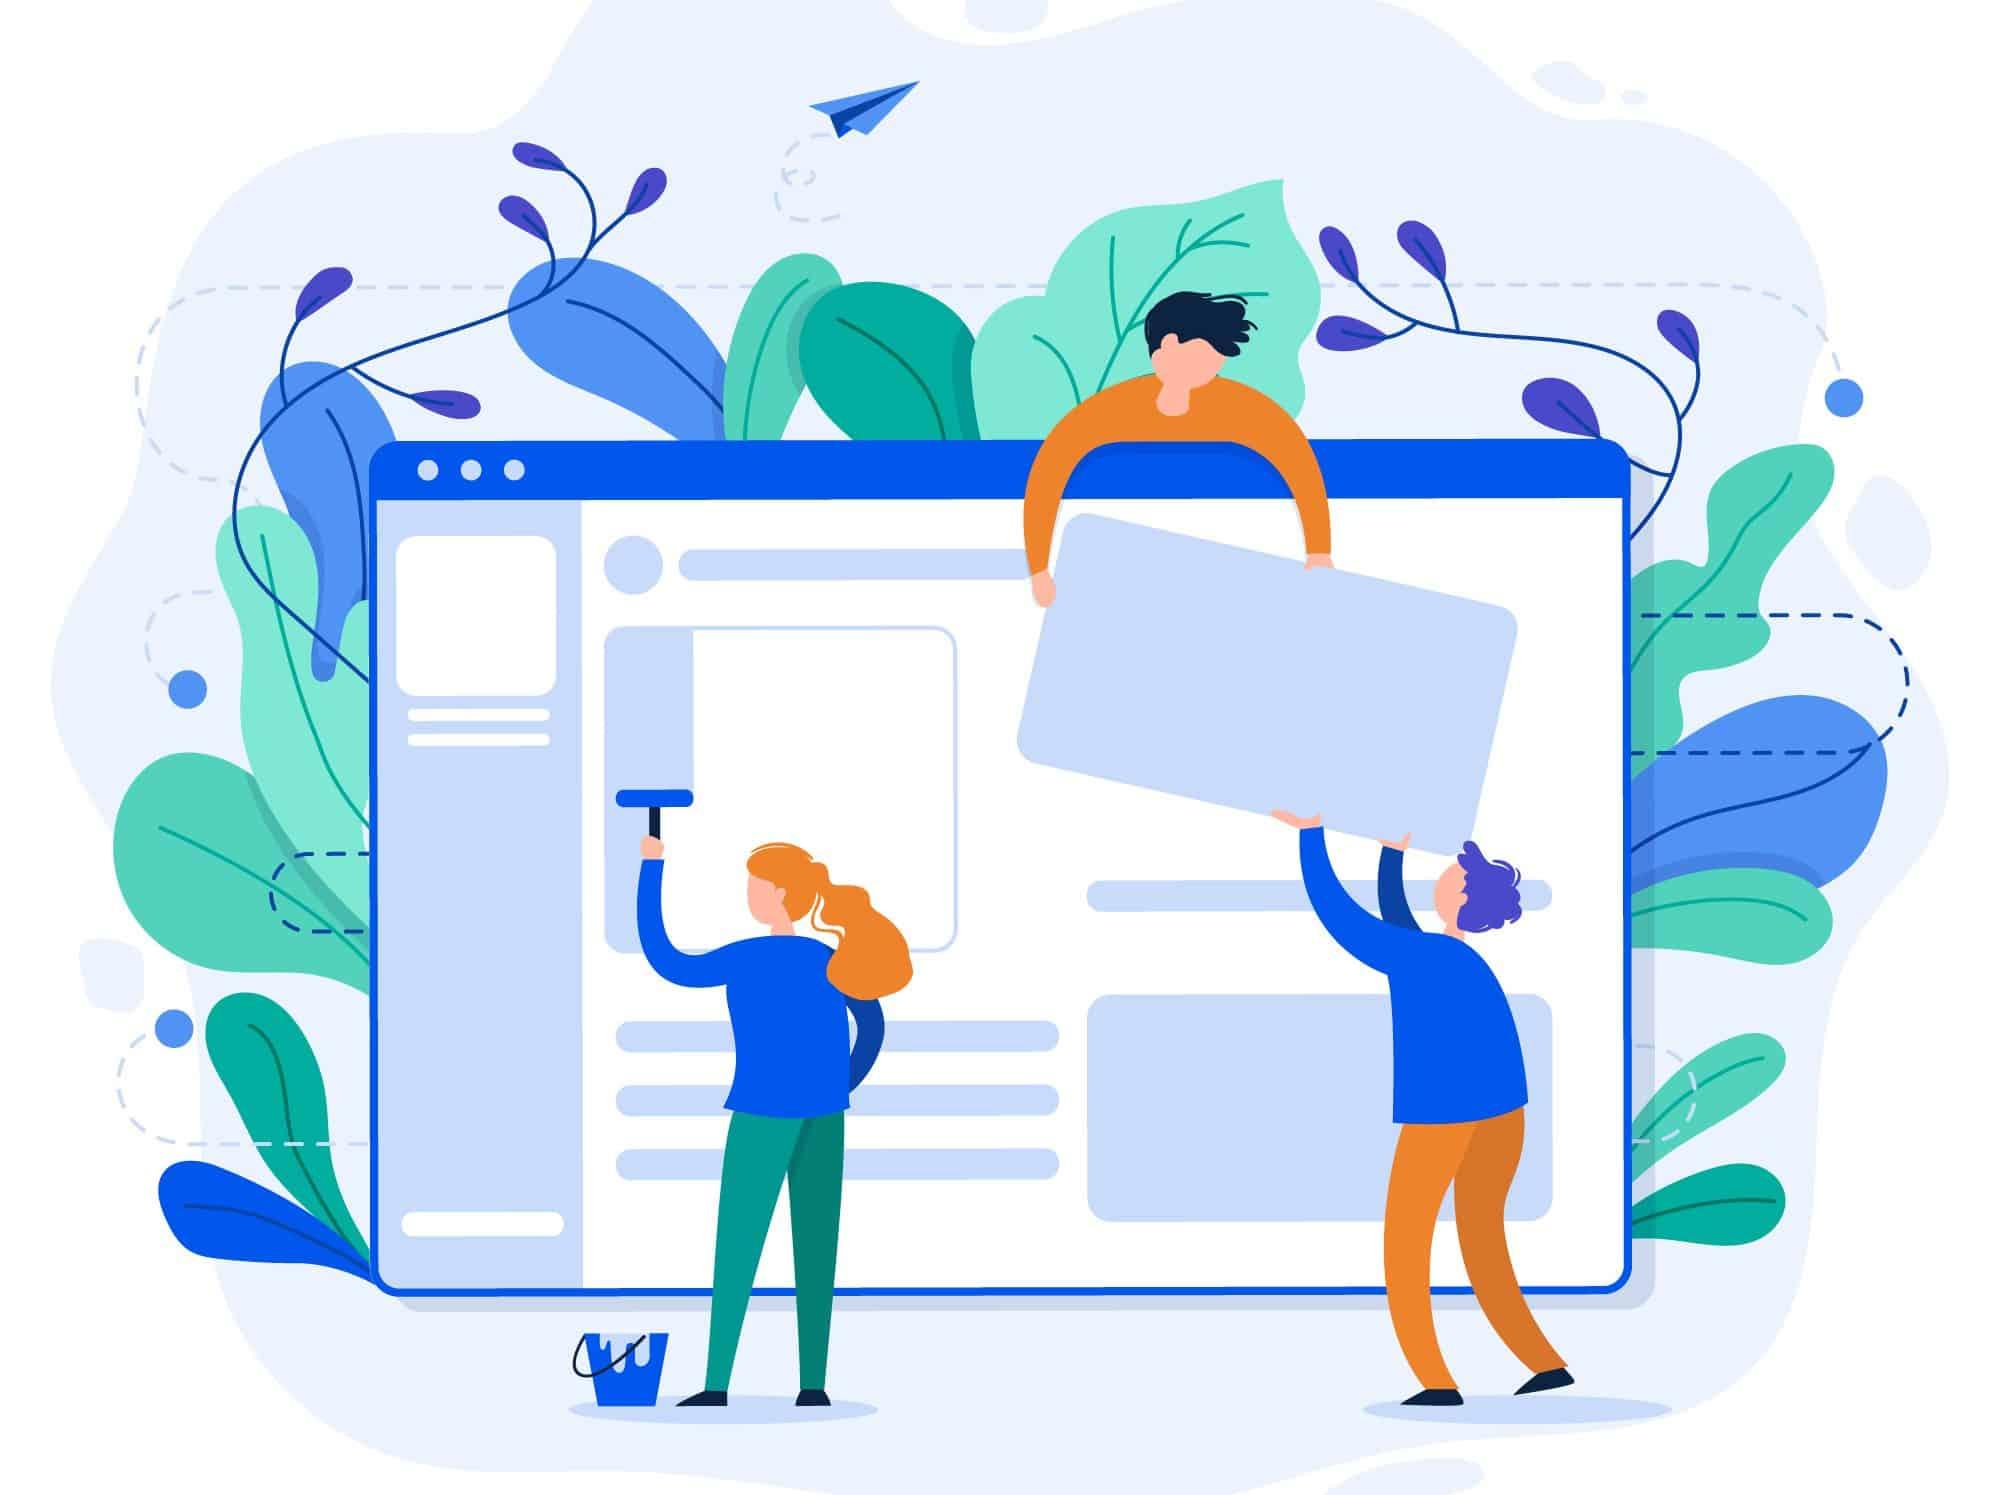 website theme change concept